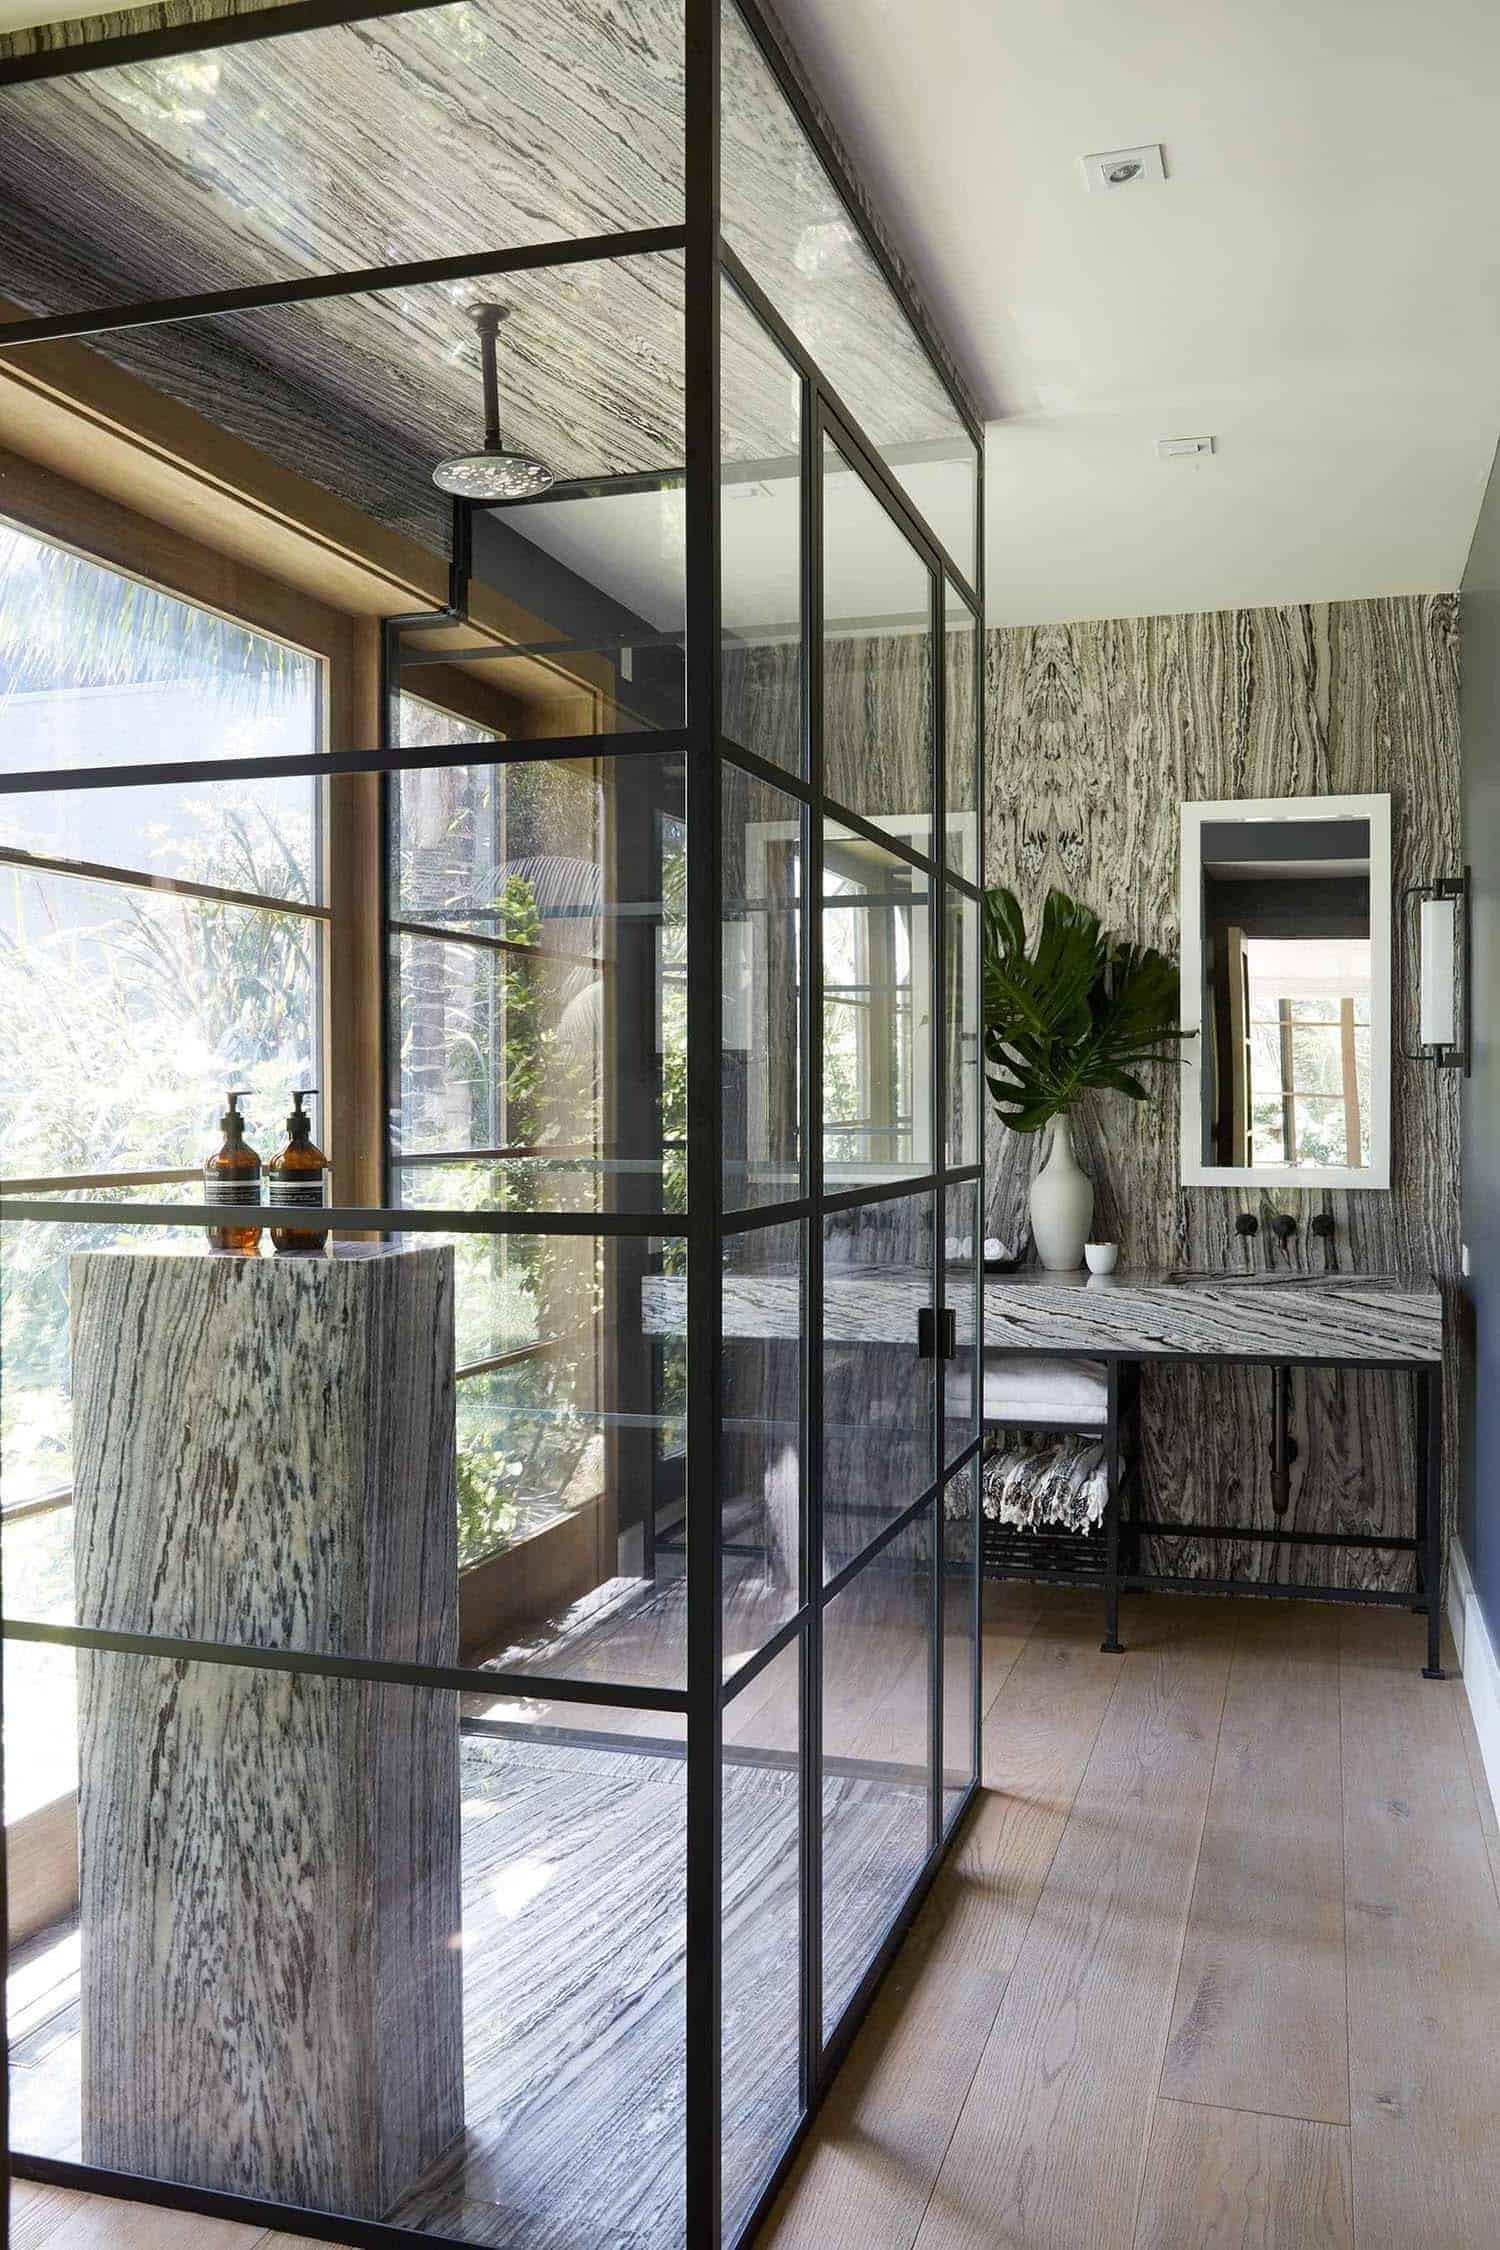 balinese-inspired-bathroom